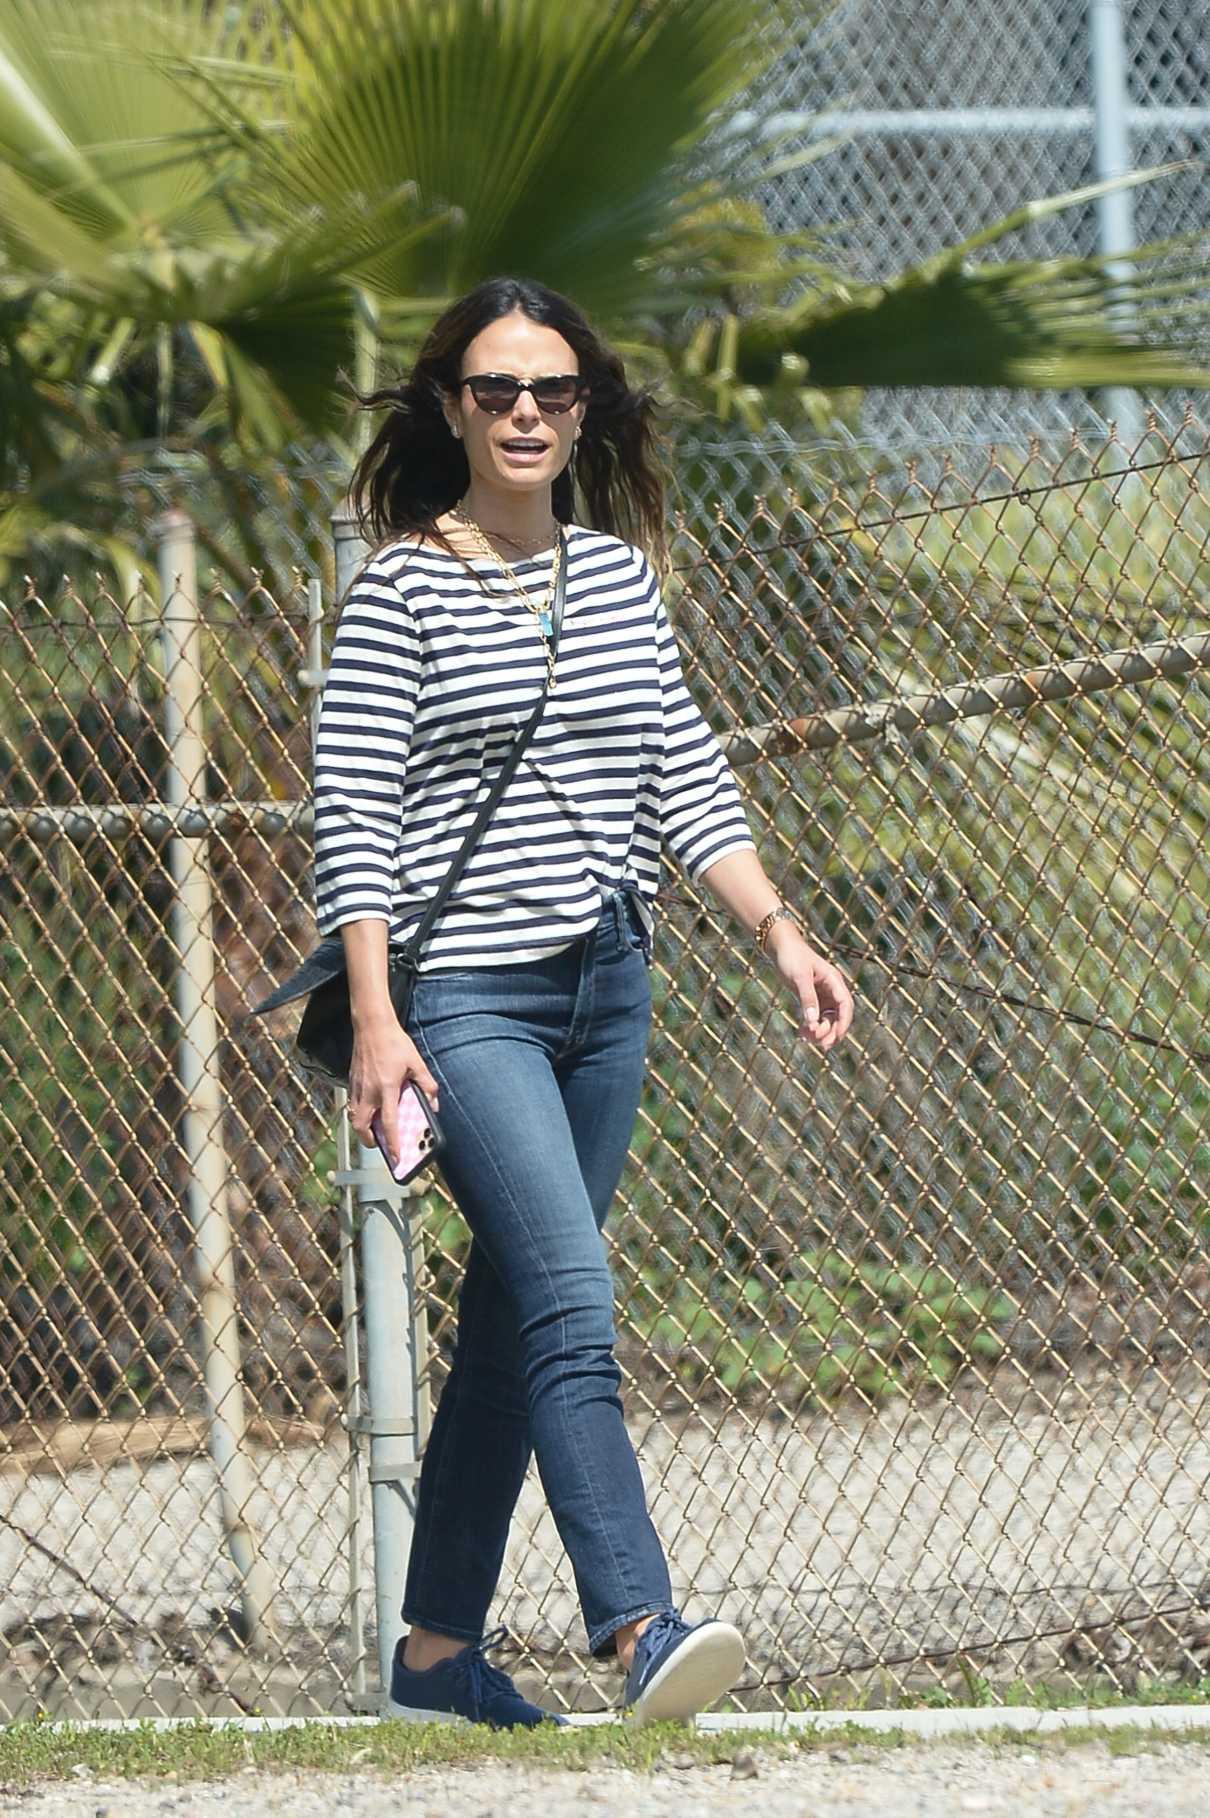 Jordana Brewster in a Striped Long Sleeves T-Shirt